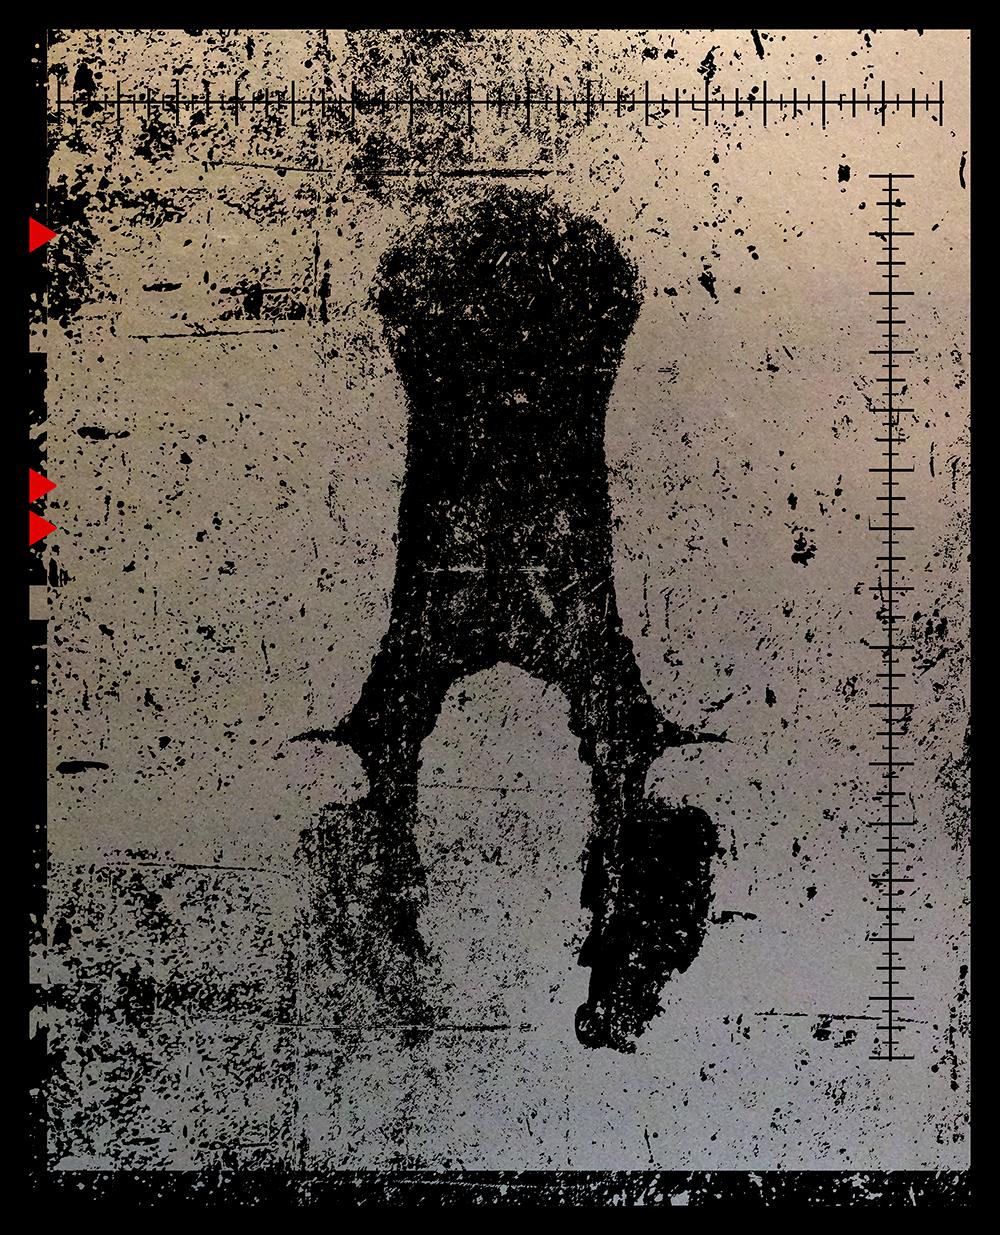 SALACIA-silhouette-3.png